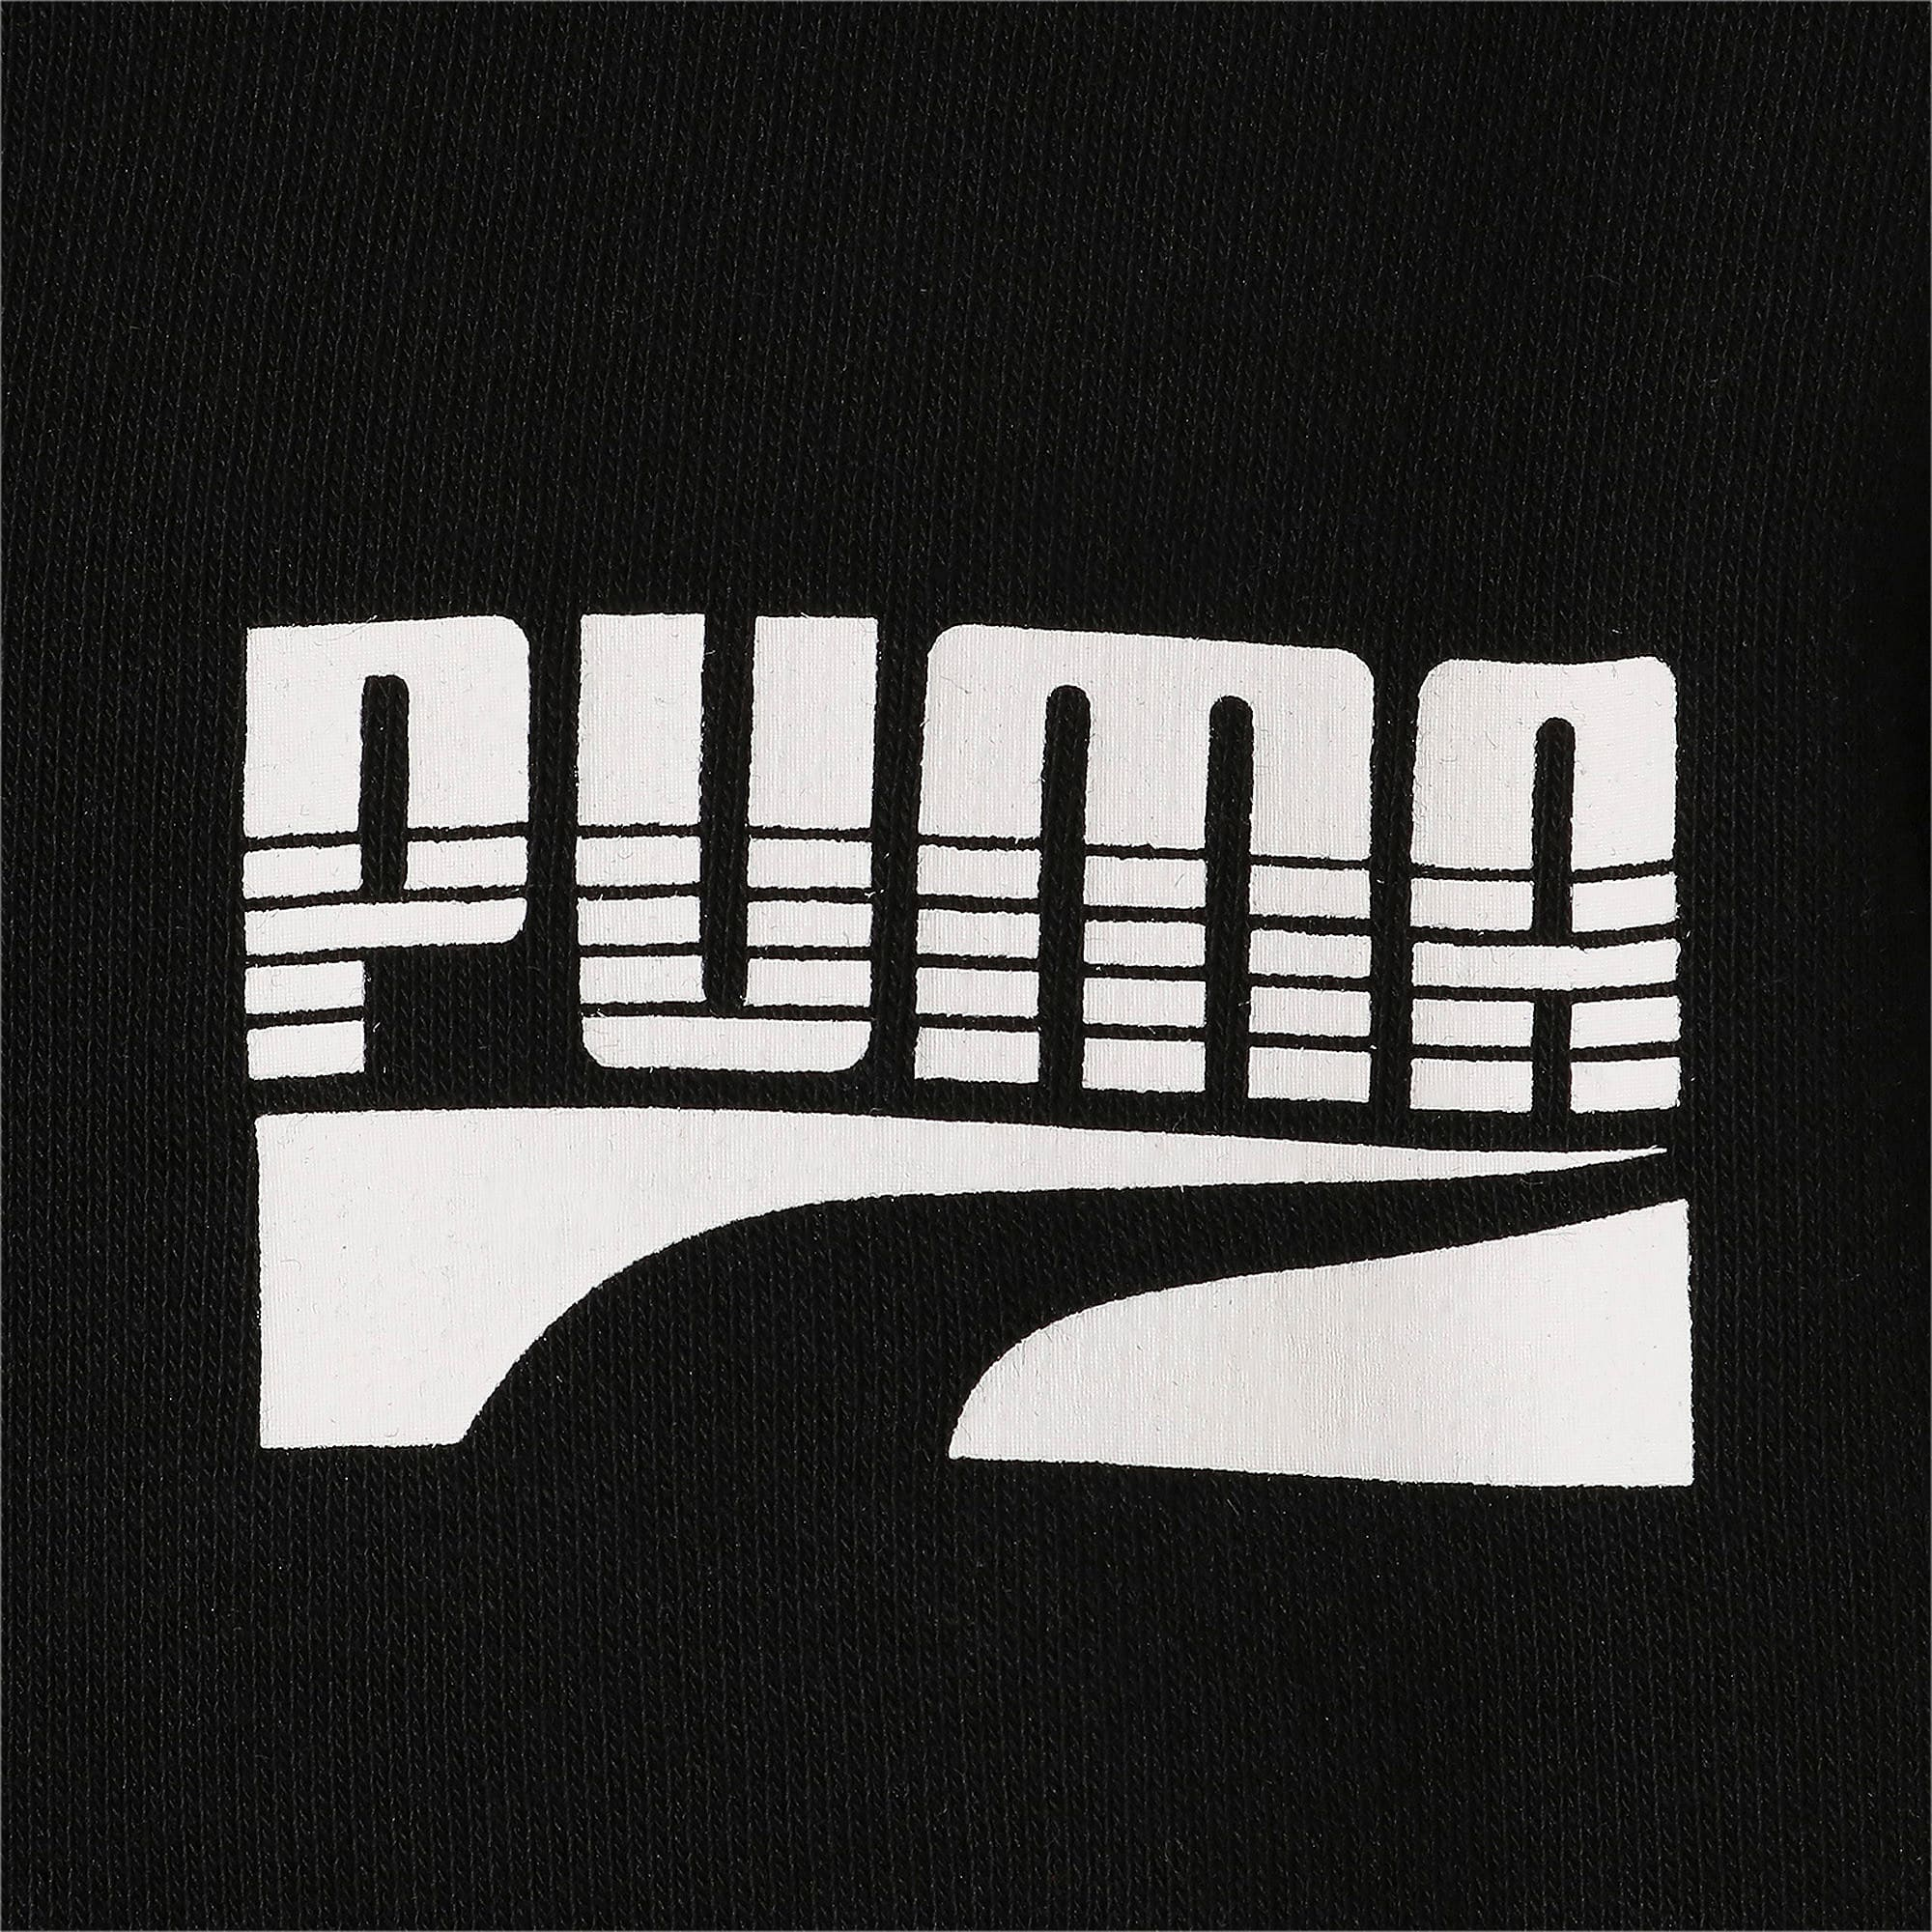 Thumbnail 8 of キッズ REBEL ボールド フルジップTR, Puma Black, medium-JPN